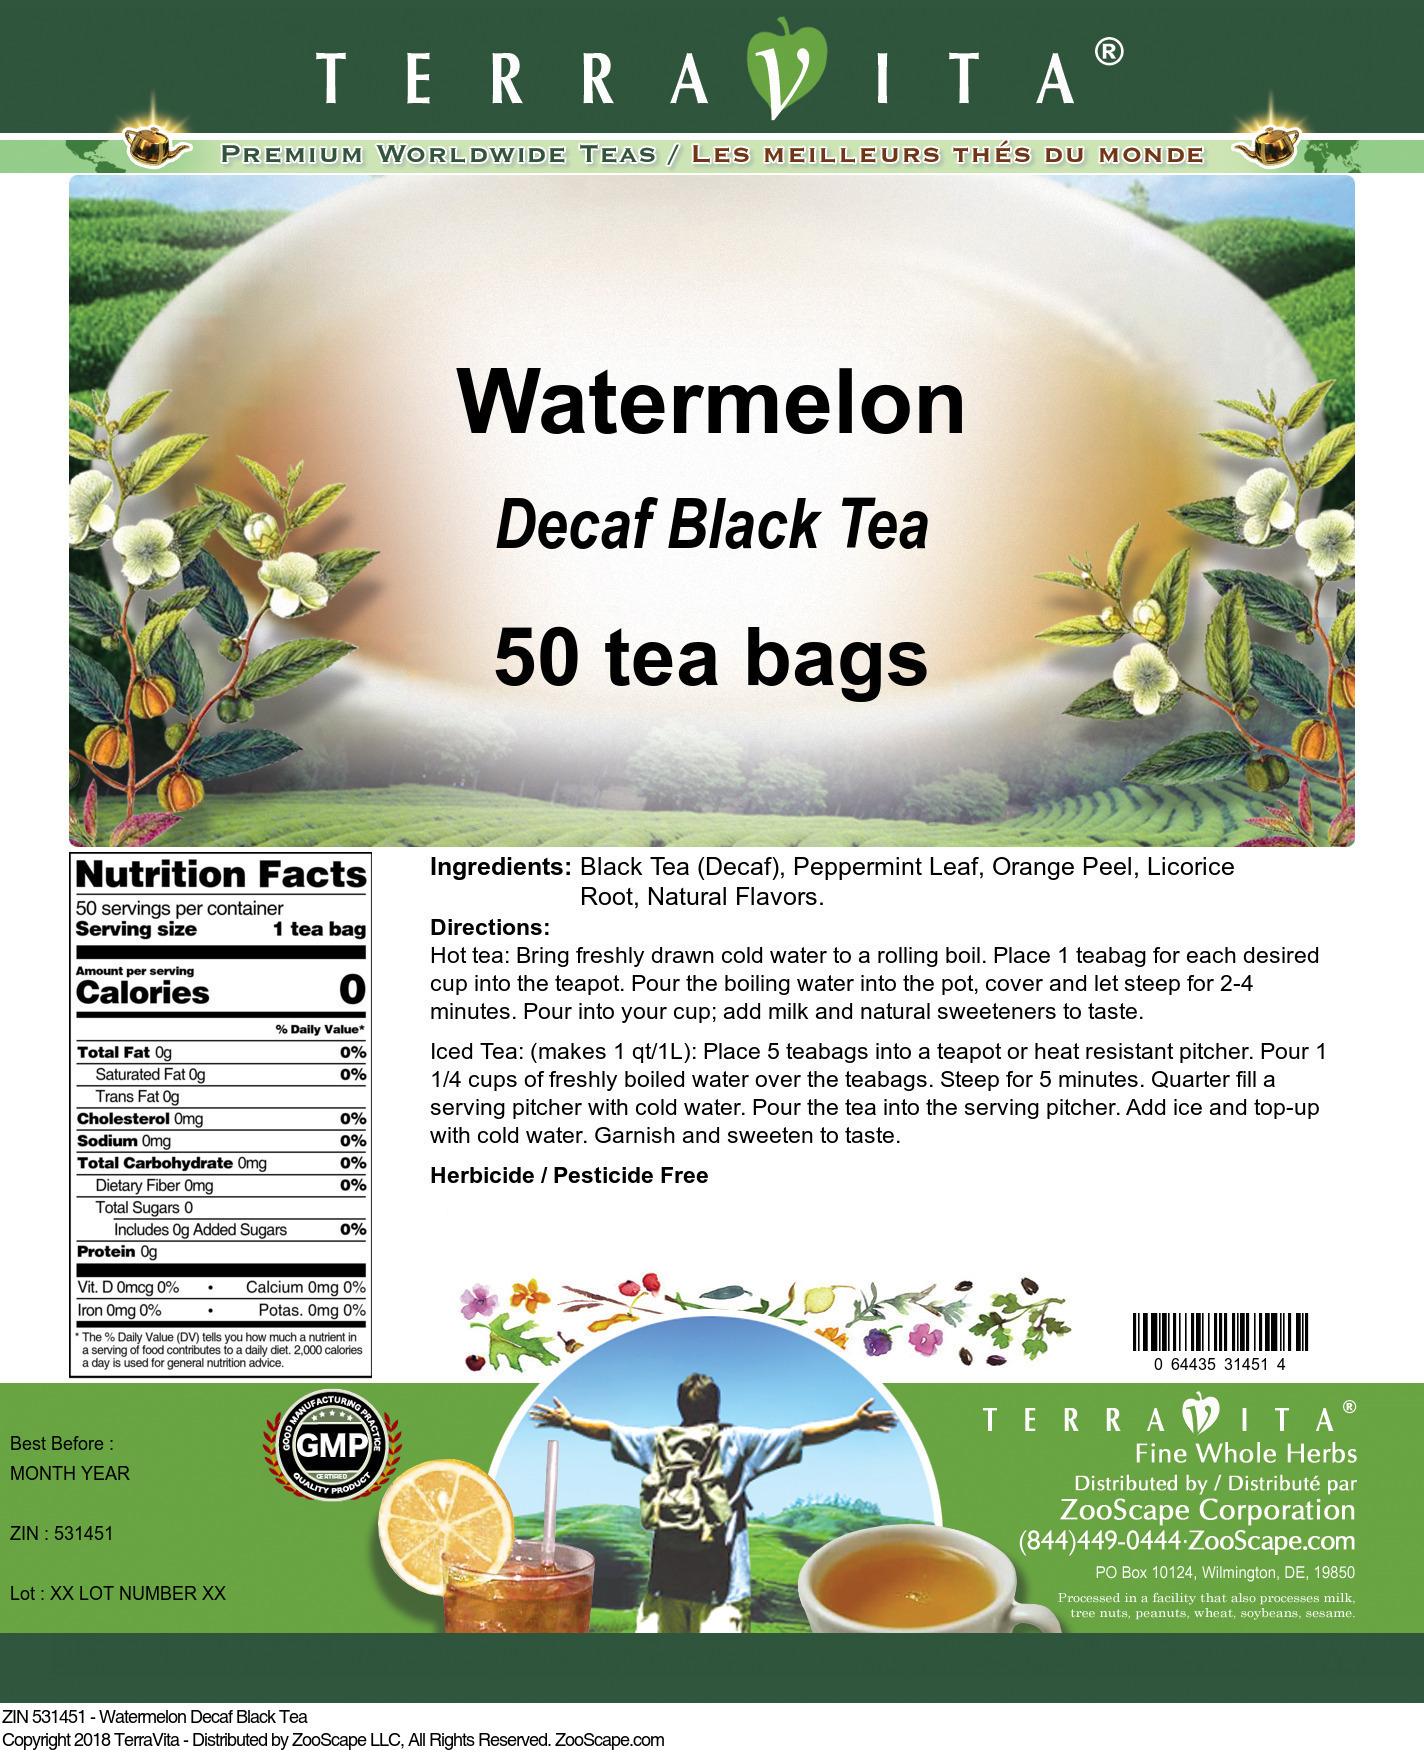 Watermelon Decaf Black Tea